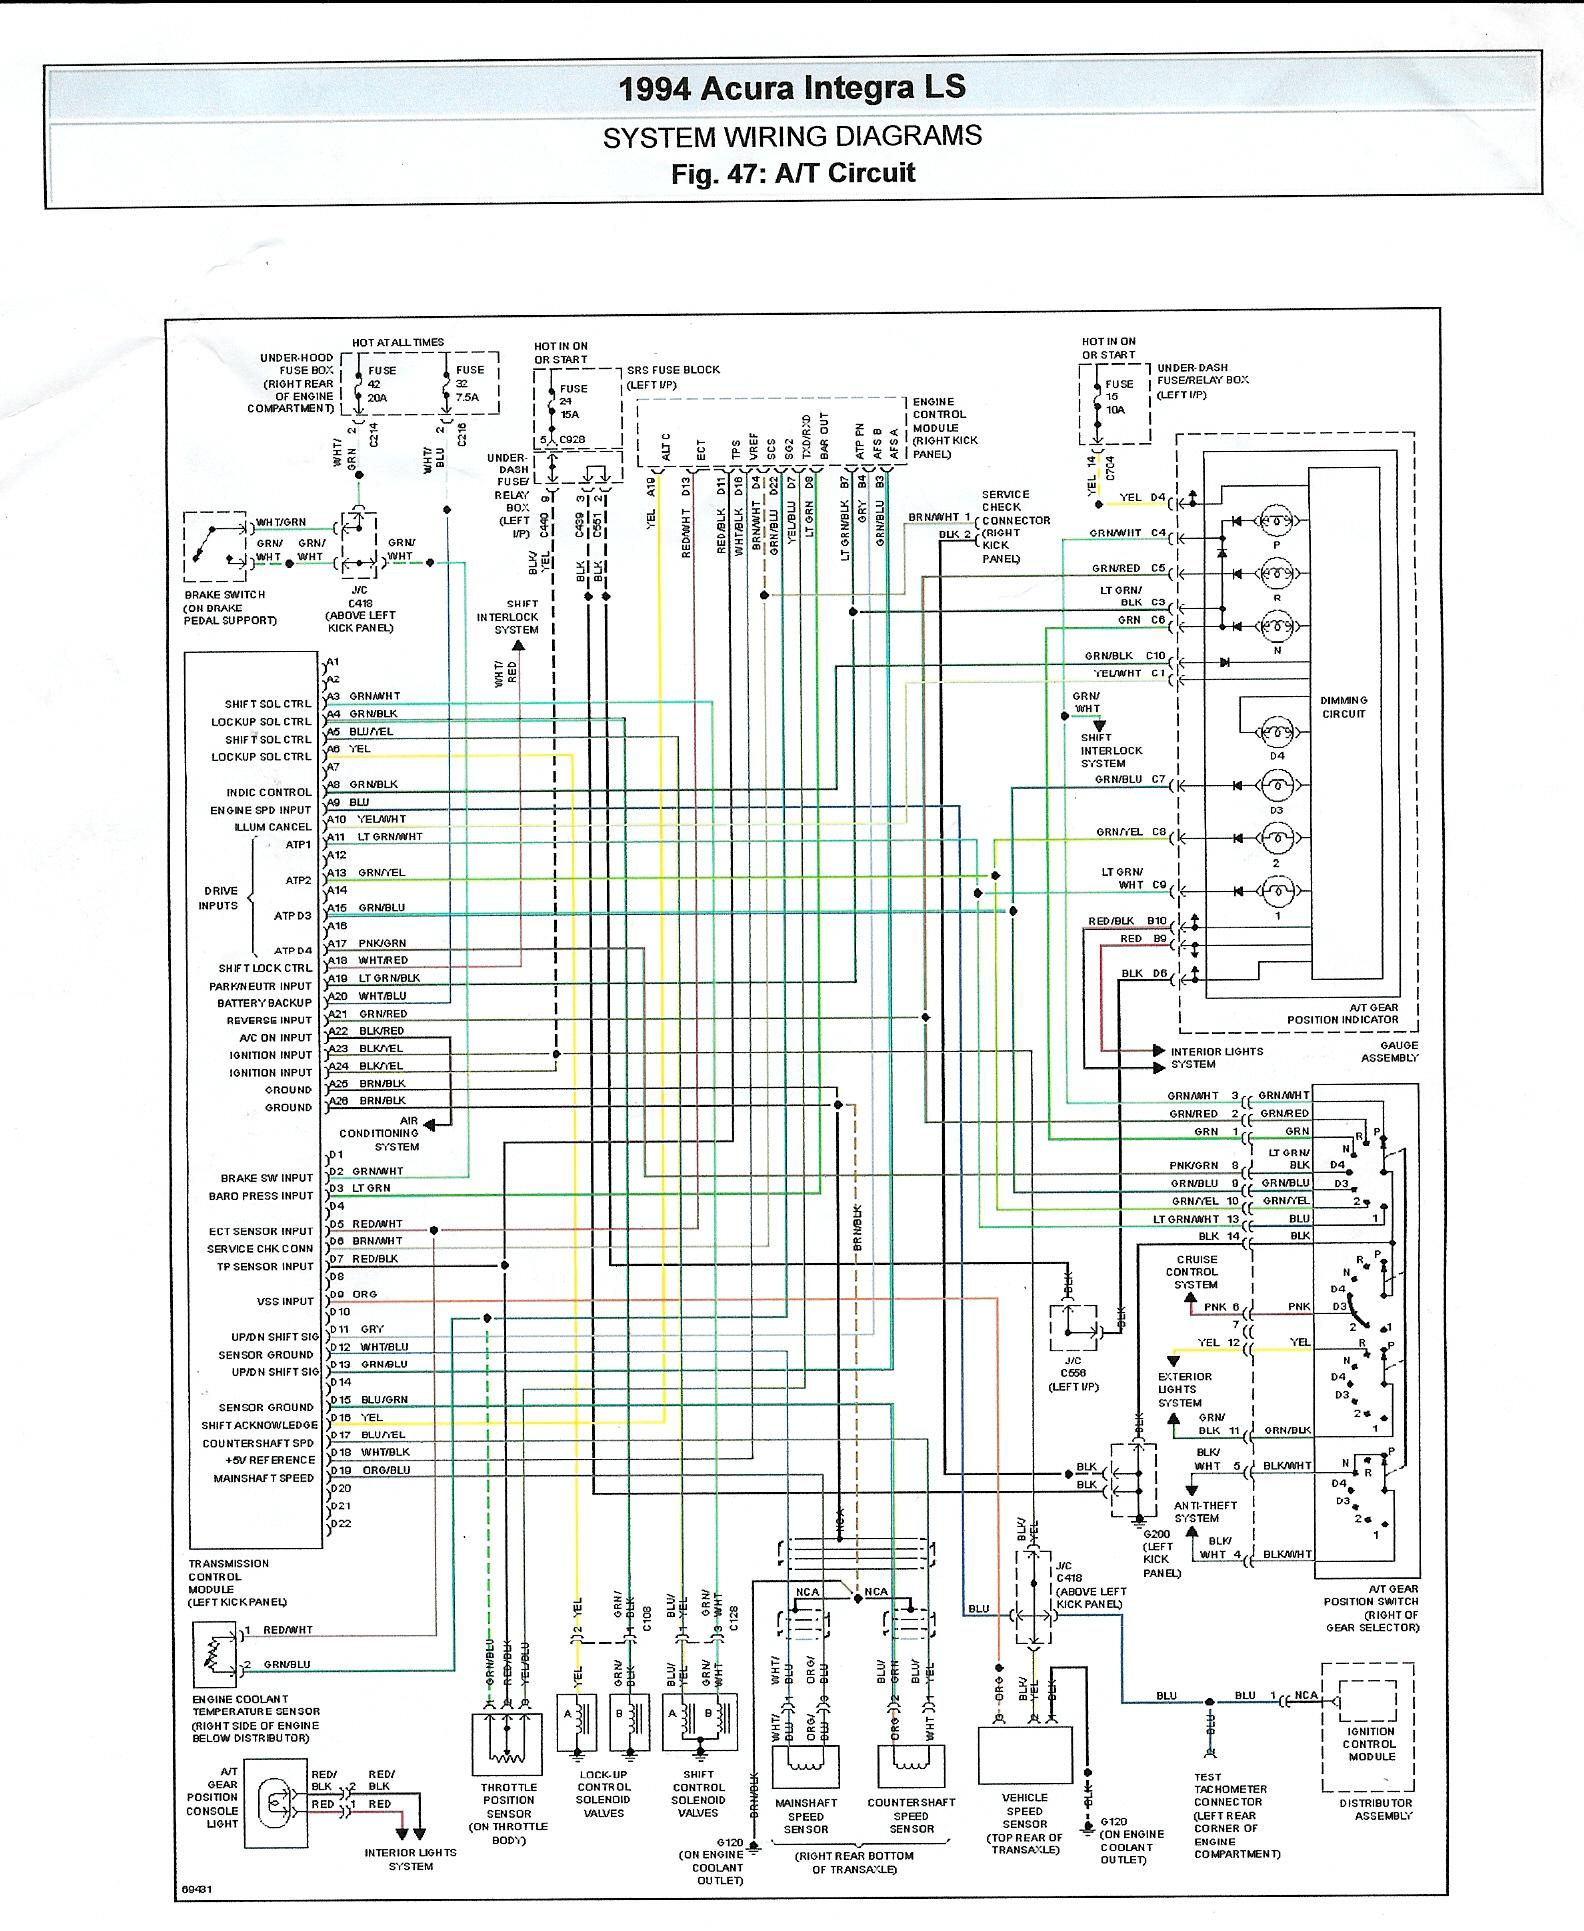 Honda accord wiring diagram 88 get free image about wiring diagram on 1991 honda accord lx wiring diagram 94 Honda Civic Ex Wiring Diagram 1991 Honda Accord Lights